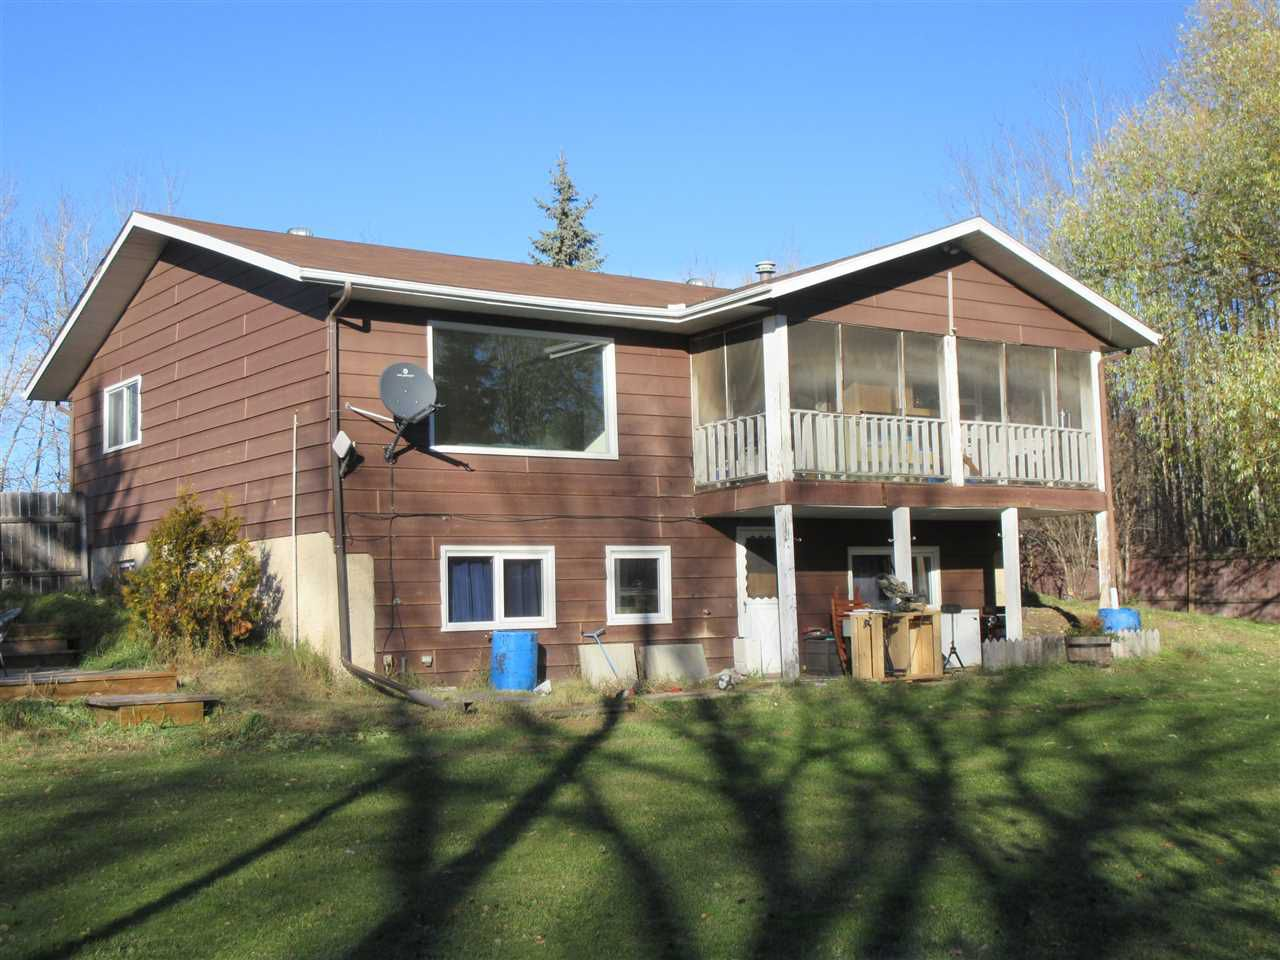 Main Photo: 323 55504 Nikoodi Road: Rural Lac Ste. Anne County House for sale : MLS®# E4133461